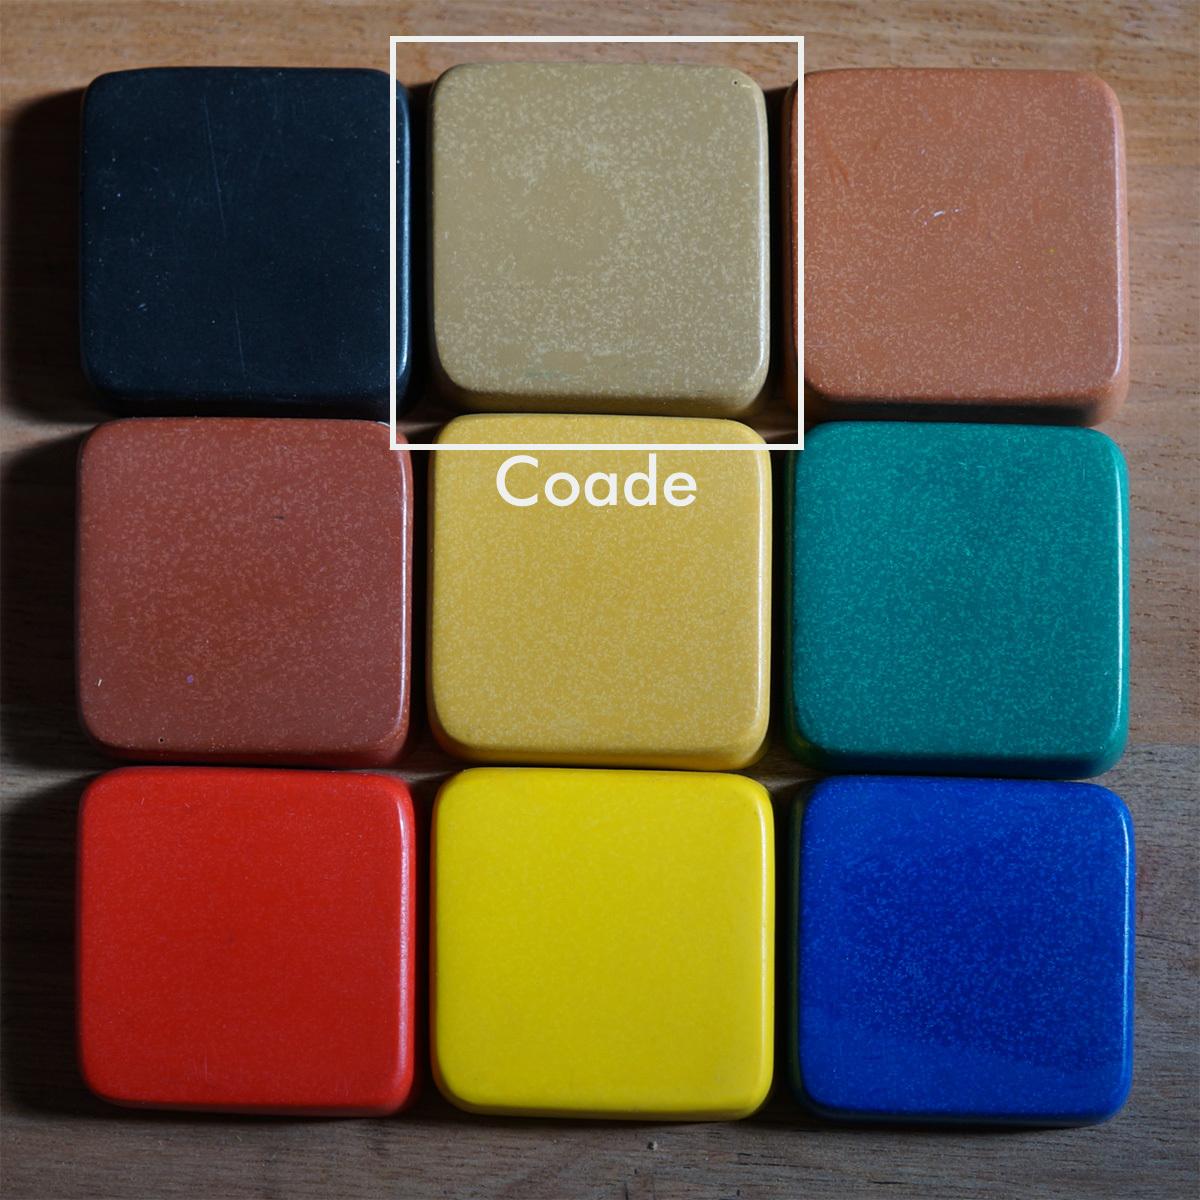 PIGMENT COADE 200g(着色剤:コード 200g) - 画像2